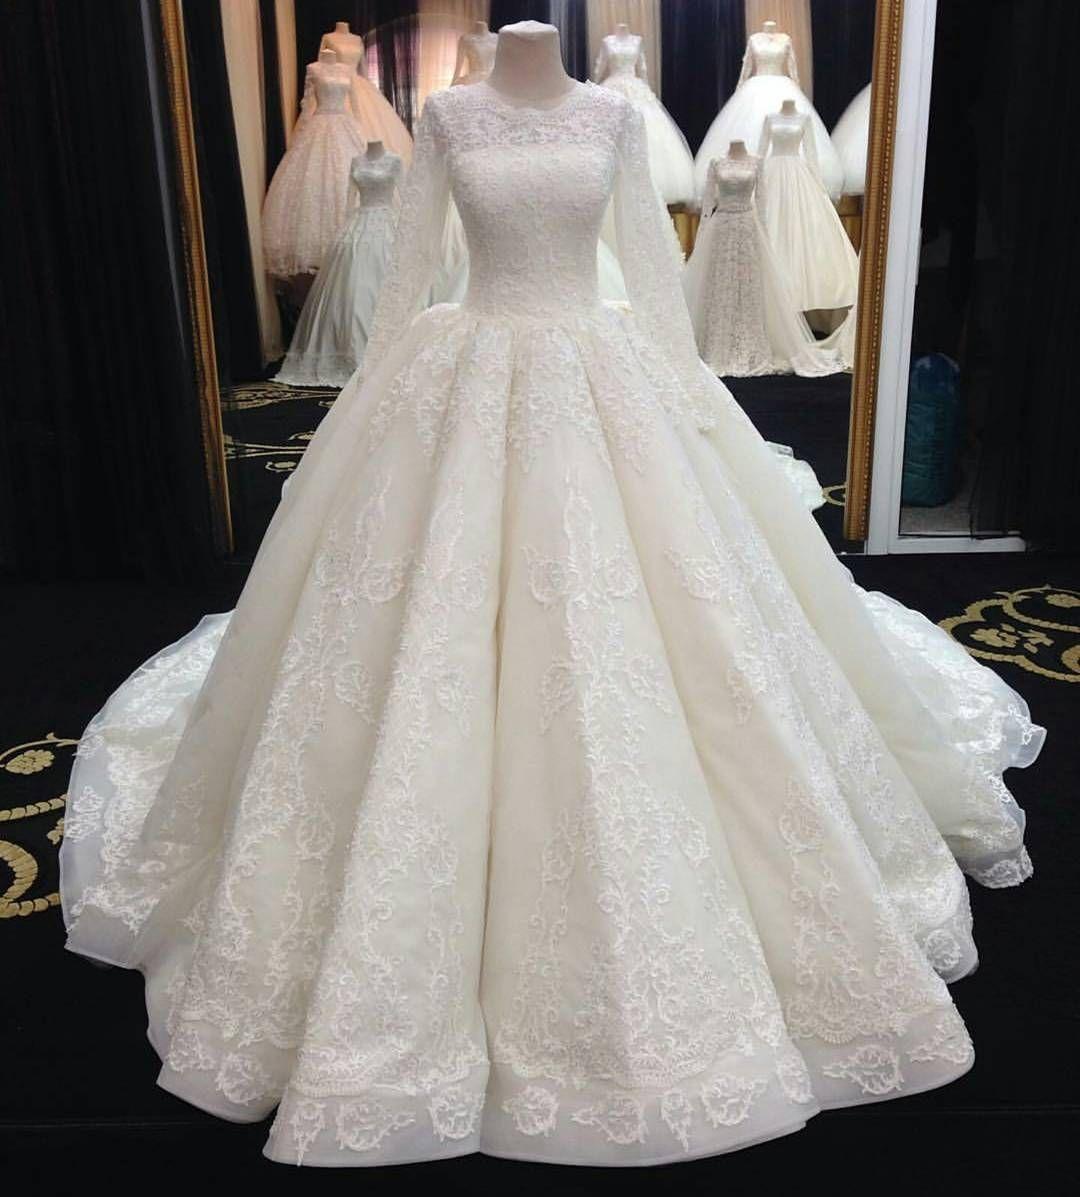 Simple Ball Gown Wedding Dress 006 - Simple Ball Gown Wedding Dress